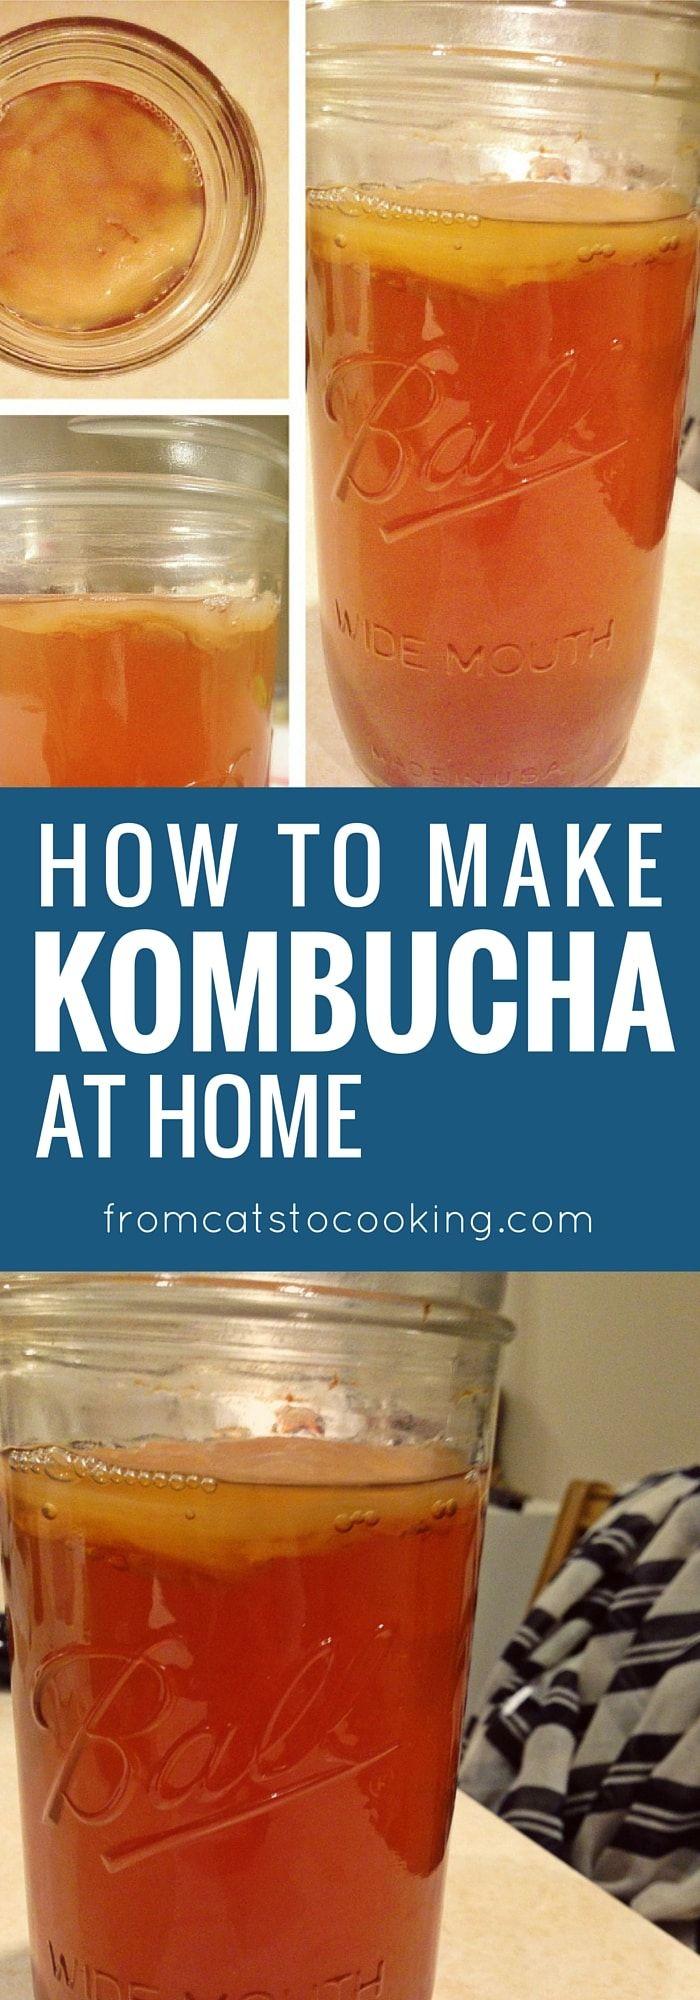 Kombucha Tea Recipe Kombucha how to make, Kombucha